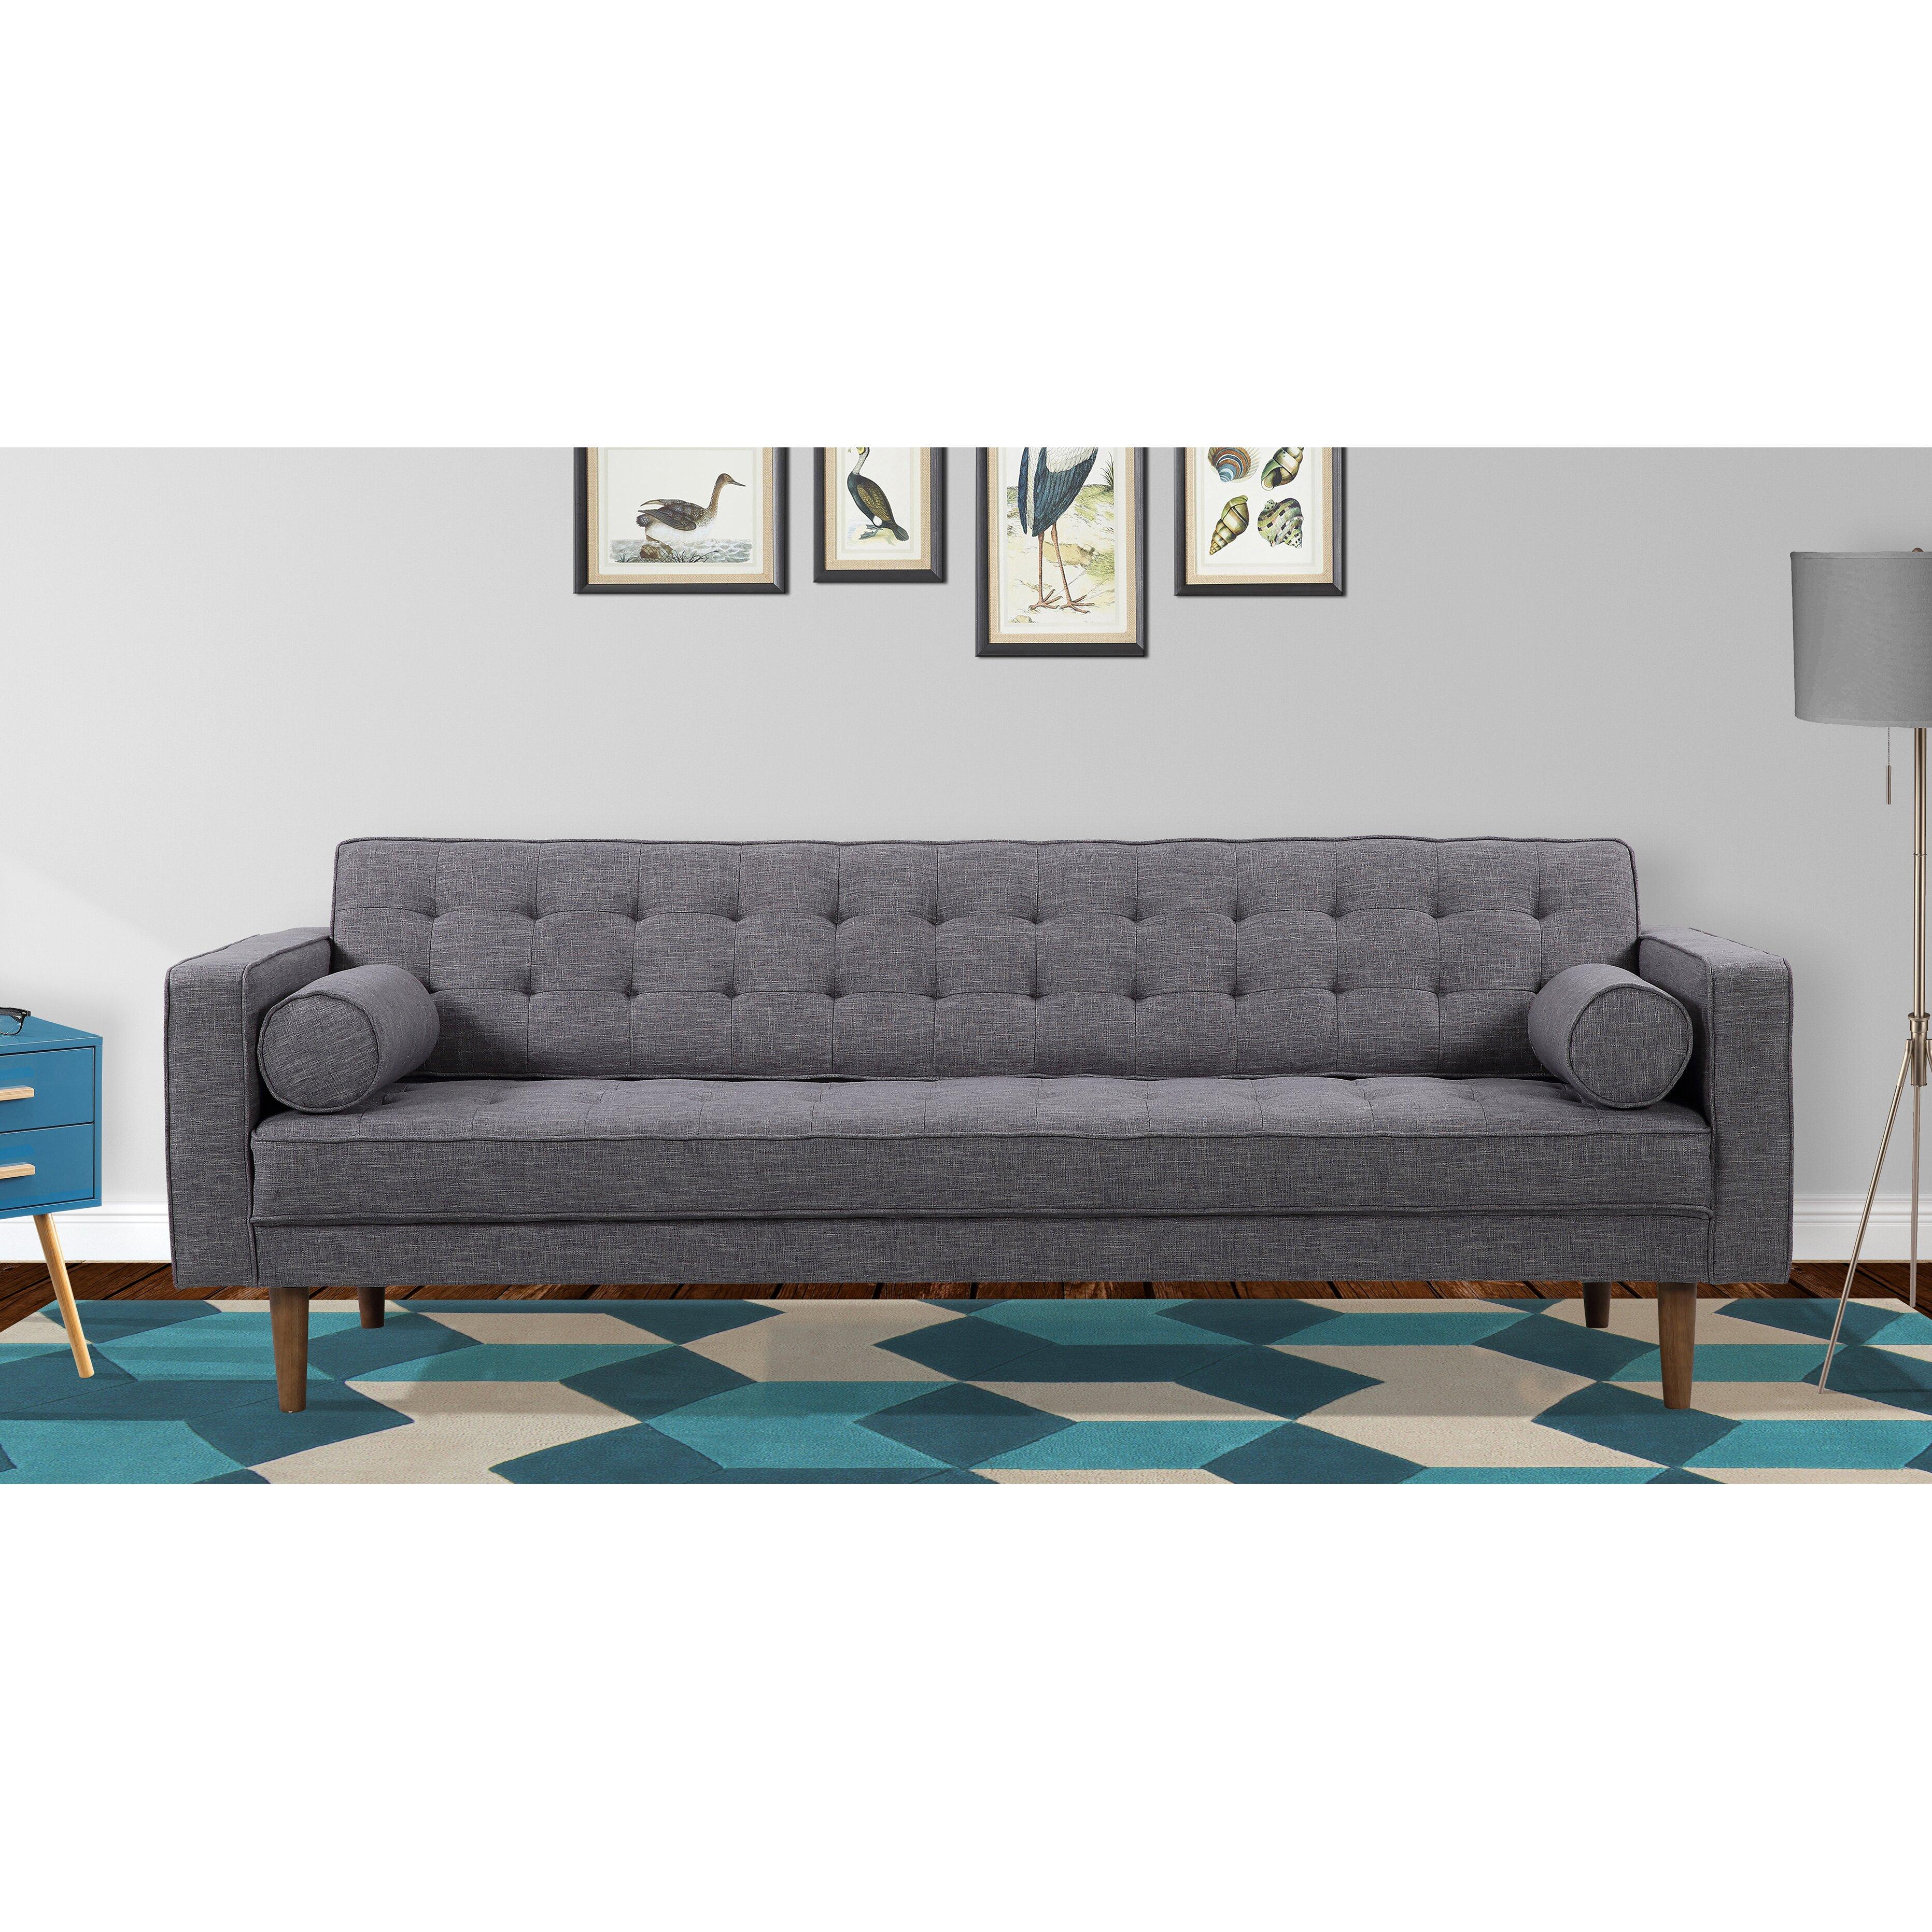 ^ orrigan Studio Nietos Mid-entury Modern Sofa & eviews Wayfair